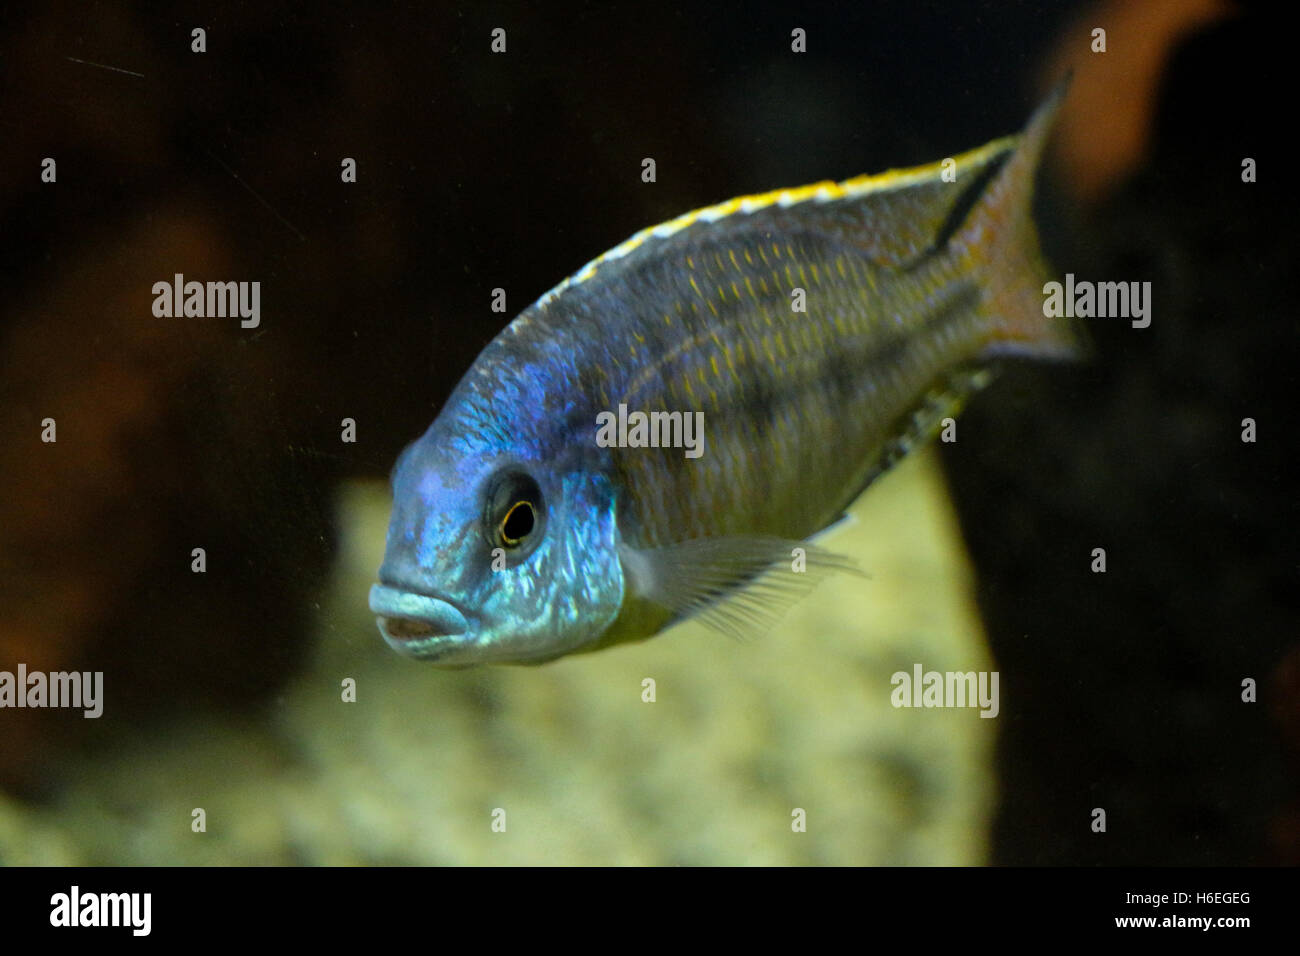 Beautiful colorful fish swims in the aquarium envıronment Stock ...